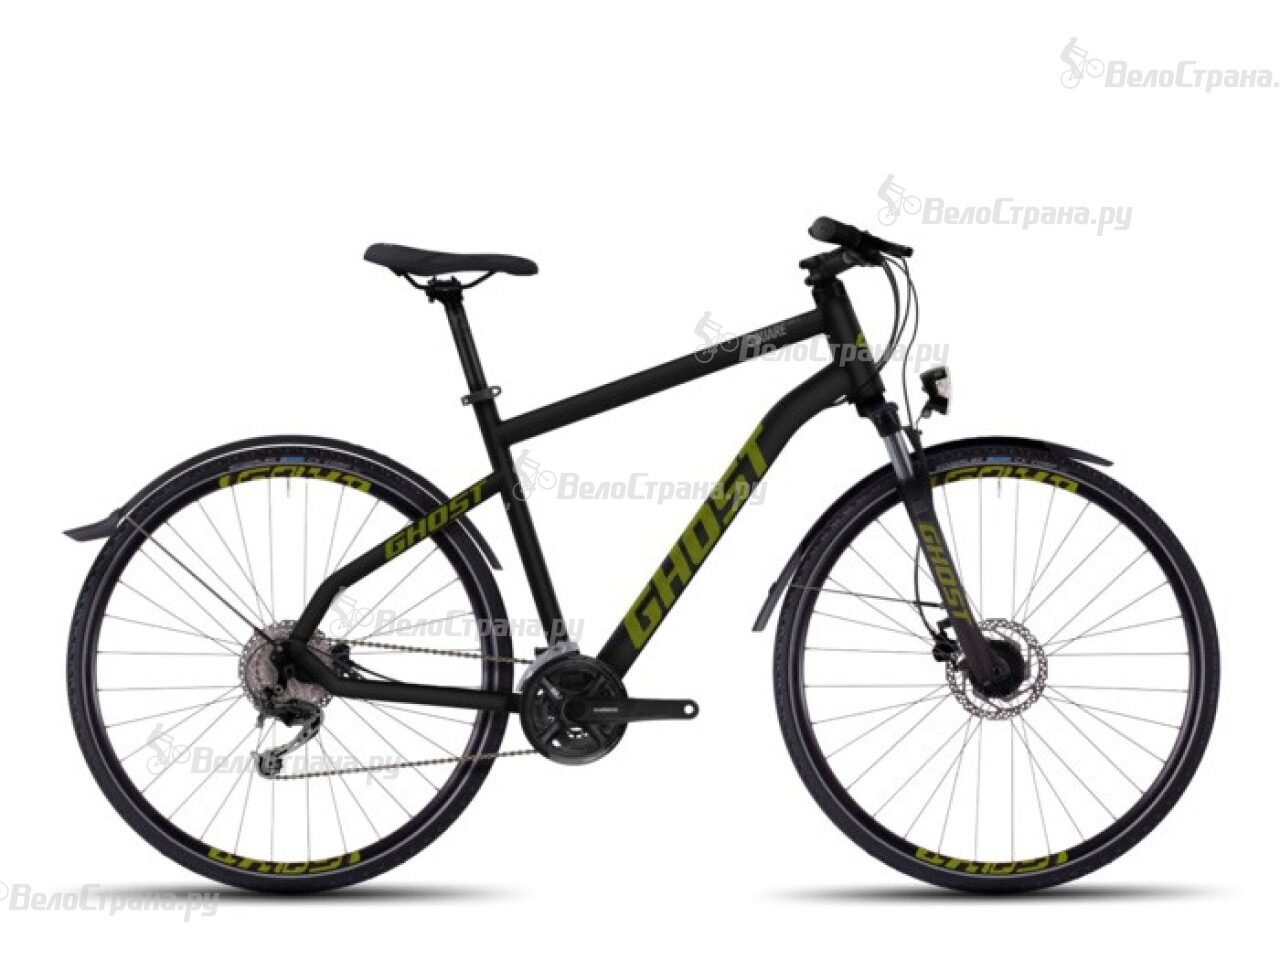 Велосипед Ghost SQUARE Cross X 4 (2016) цены онлайн